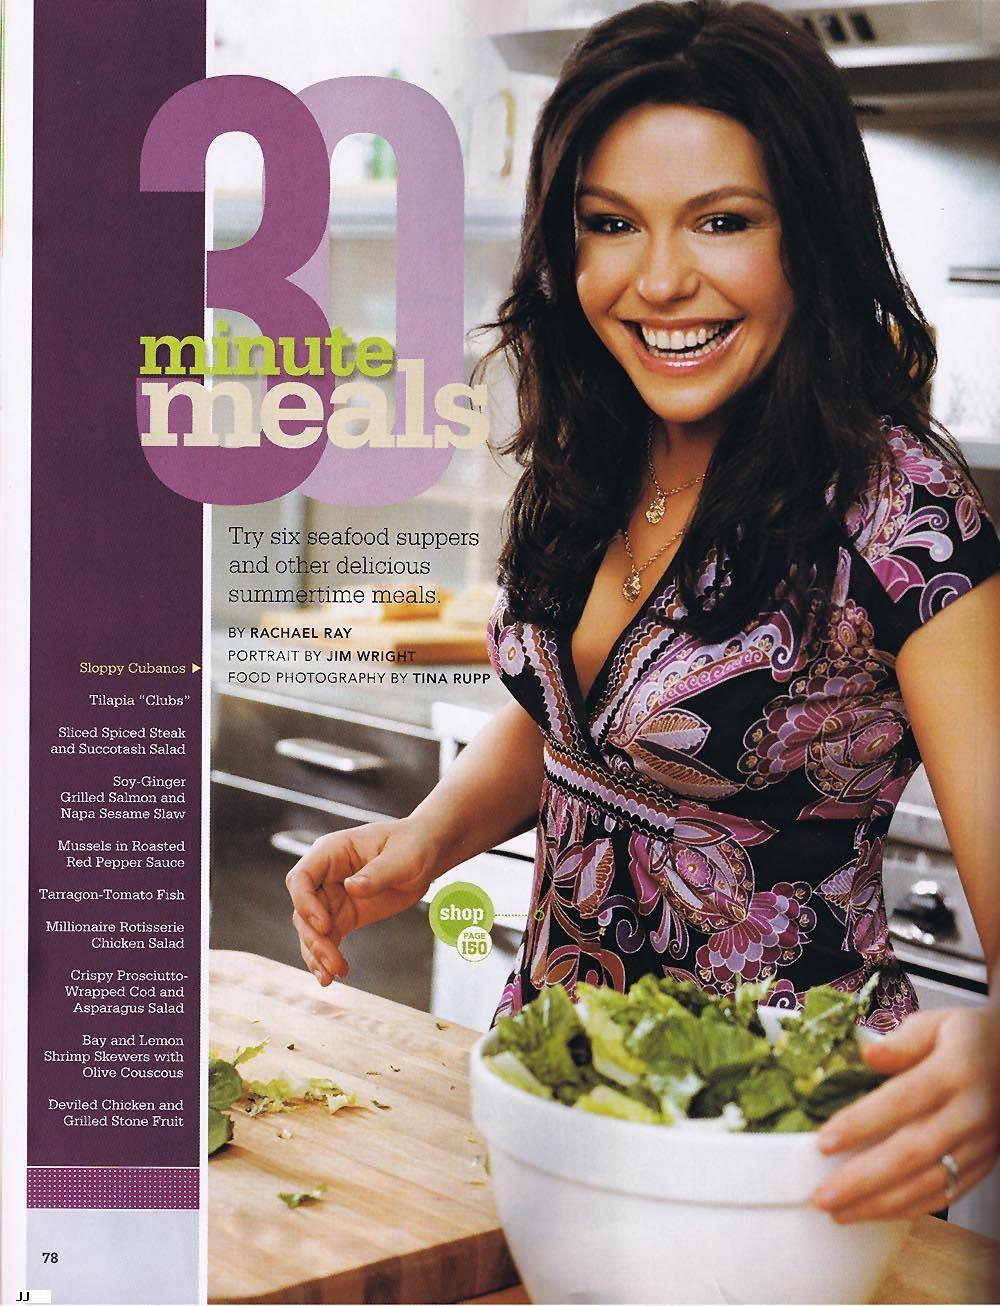 Rachael Ray | Rachael ray, Rachael ray magazine, Famous girls